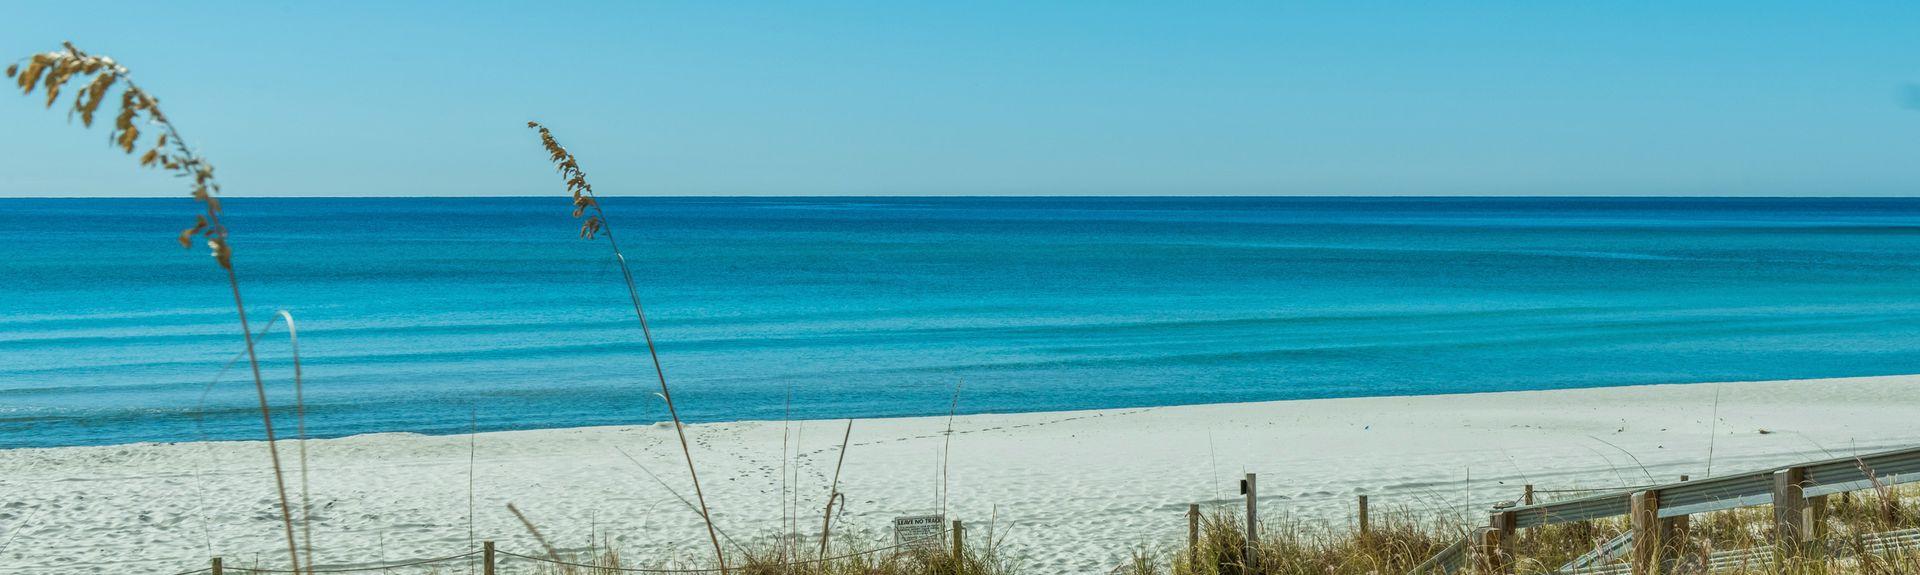 Ocean Reef, Open Sands, Panama City Beach, FL, USA